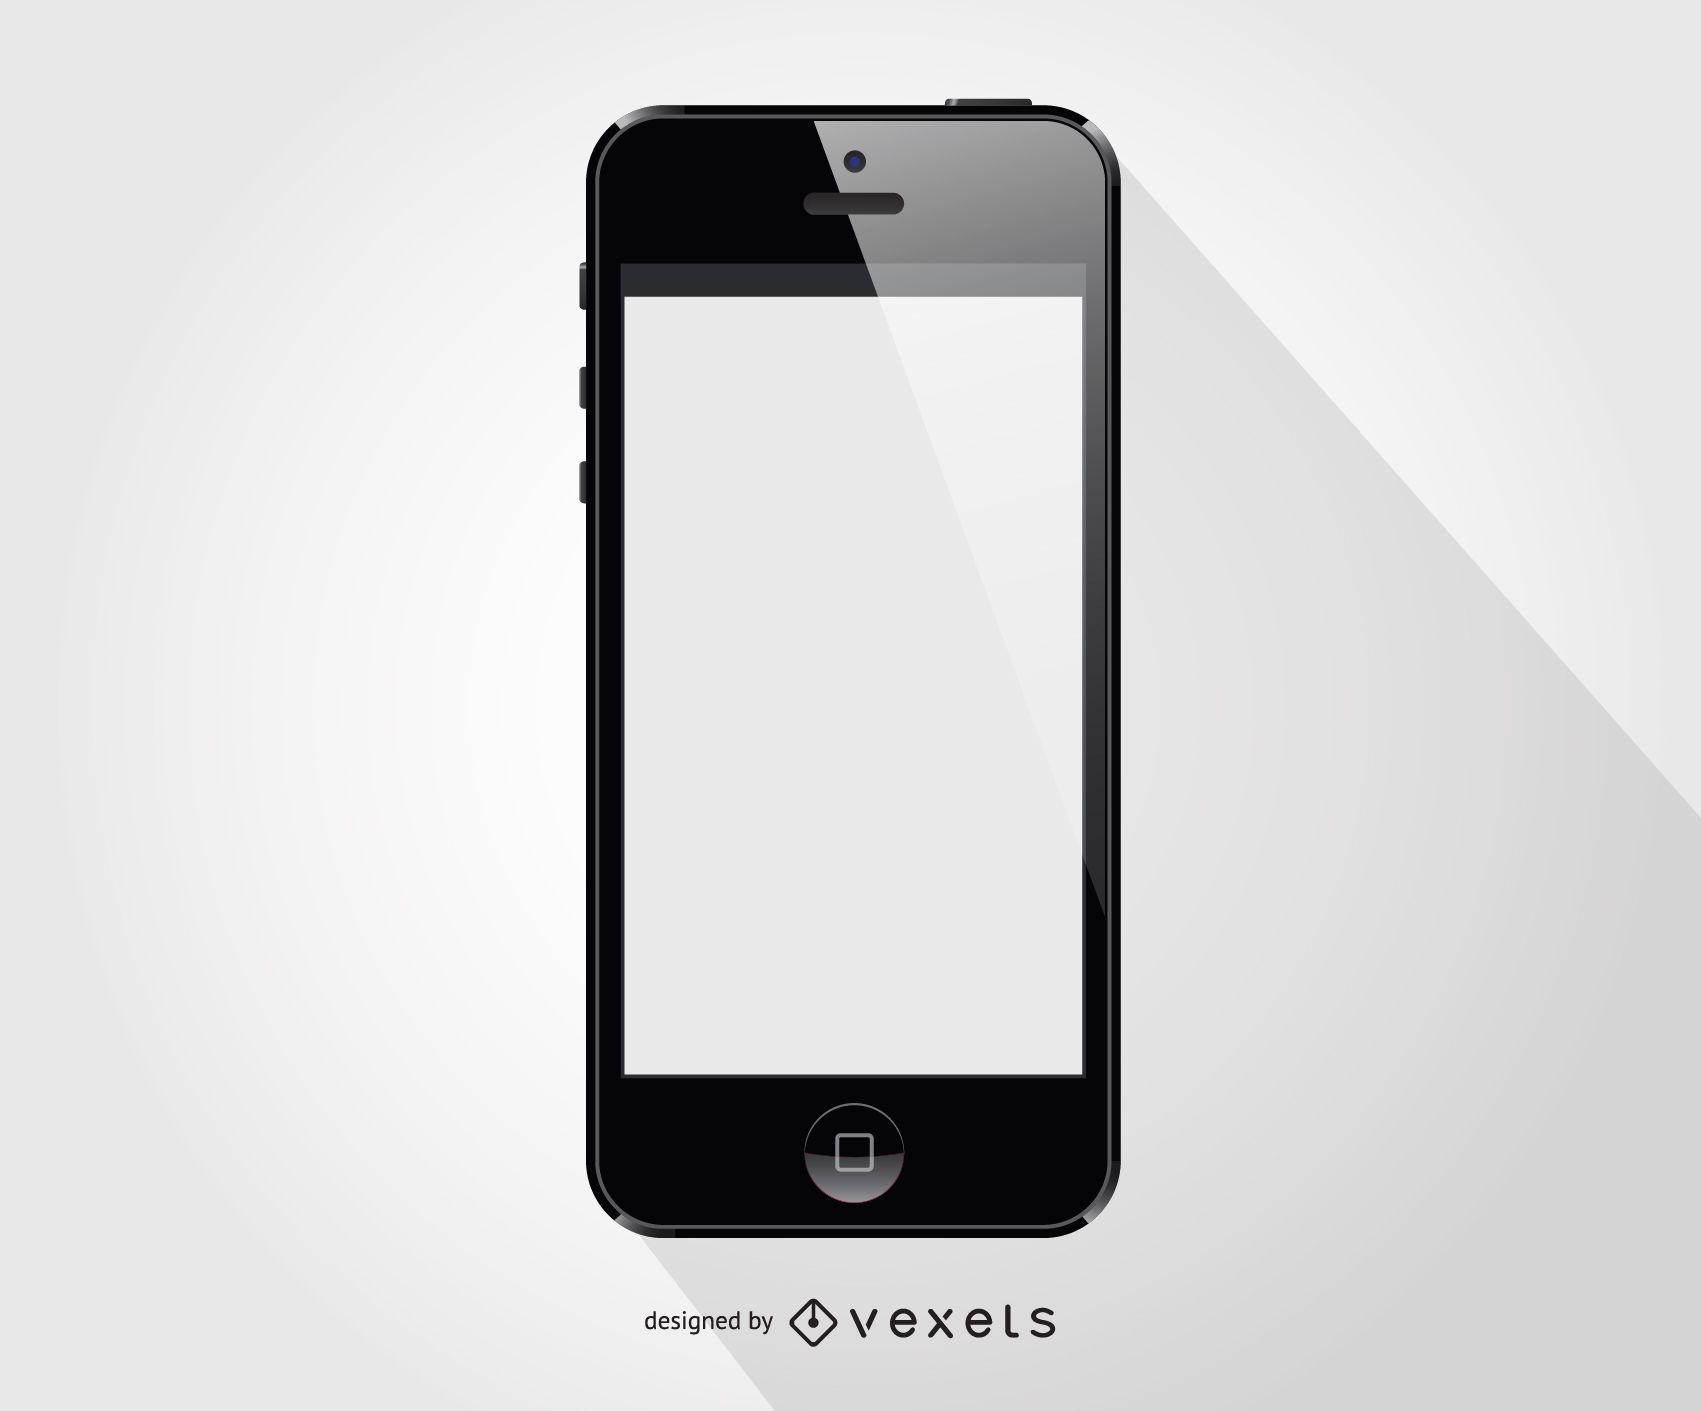 Iphone smartphone front template - Vector download